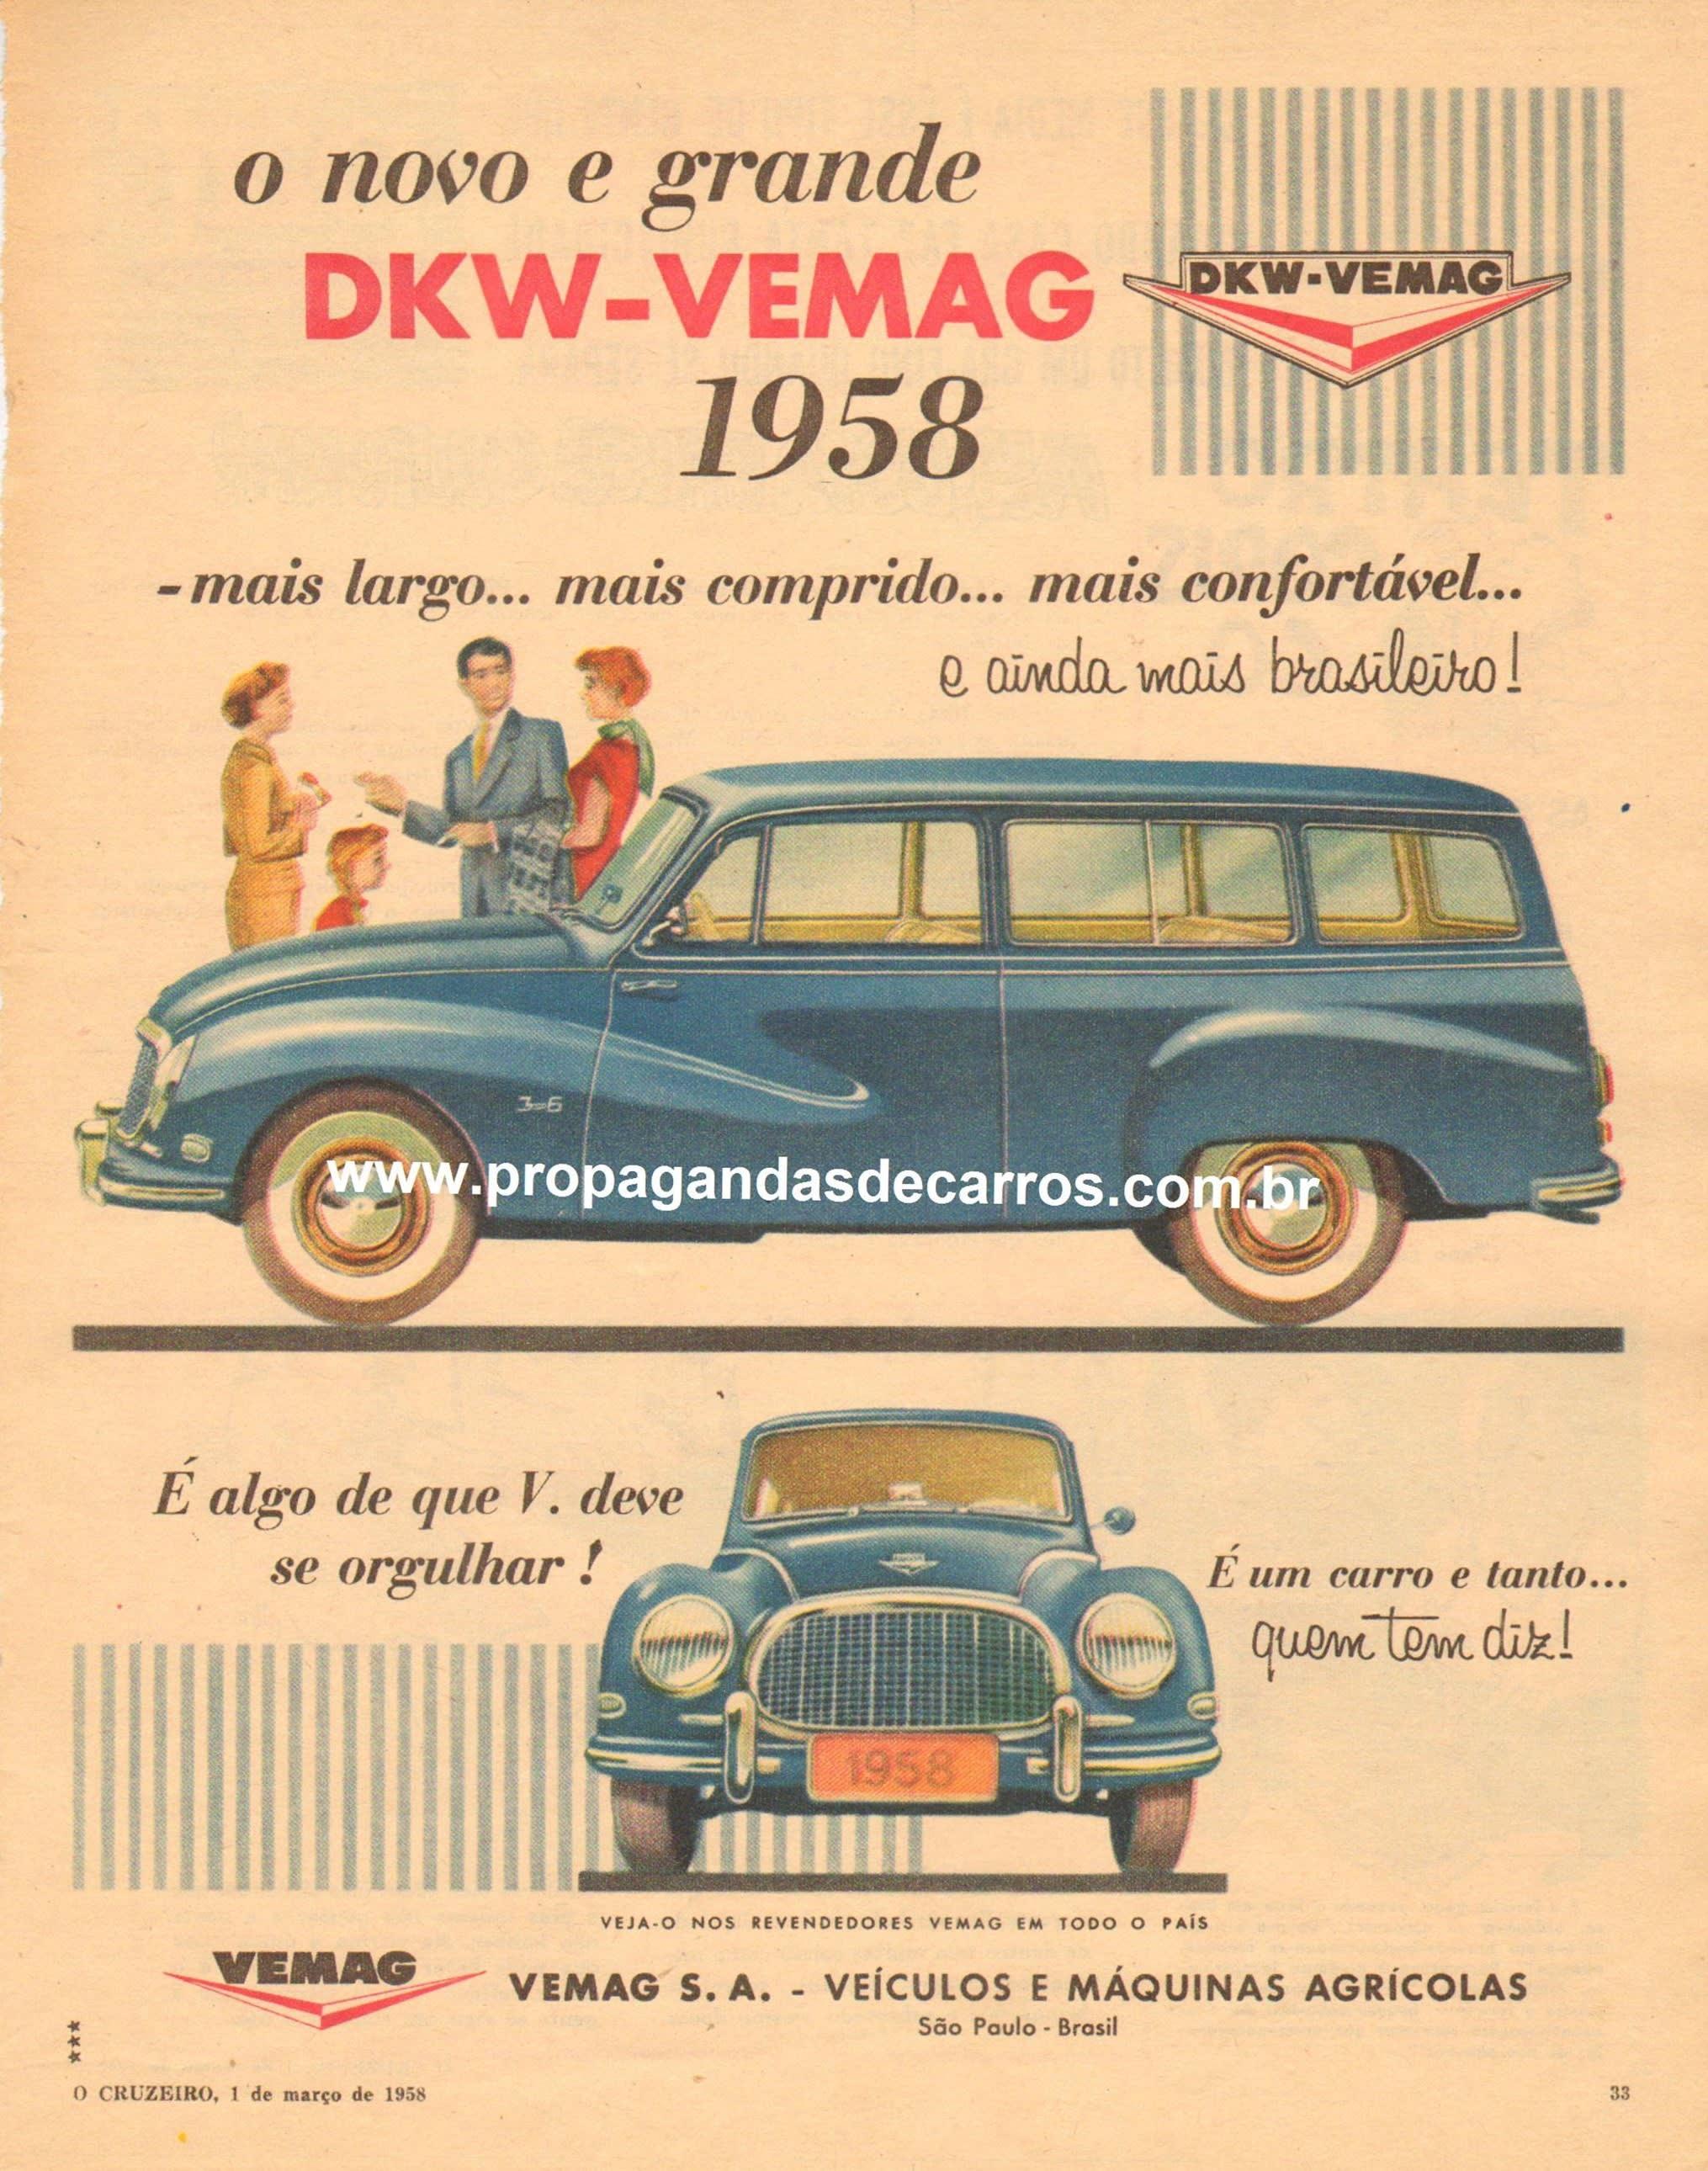 http://www.propagandasdecarros.com.br/